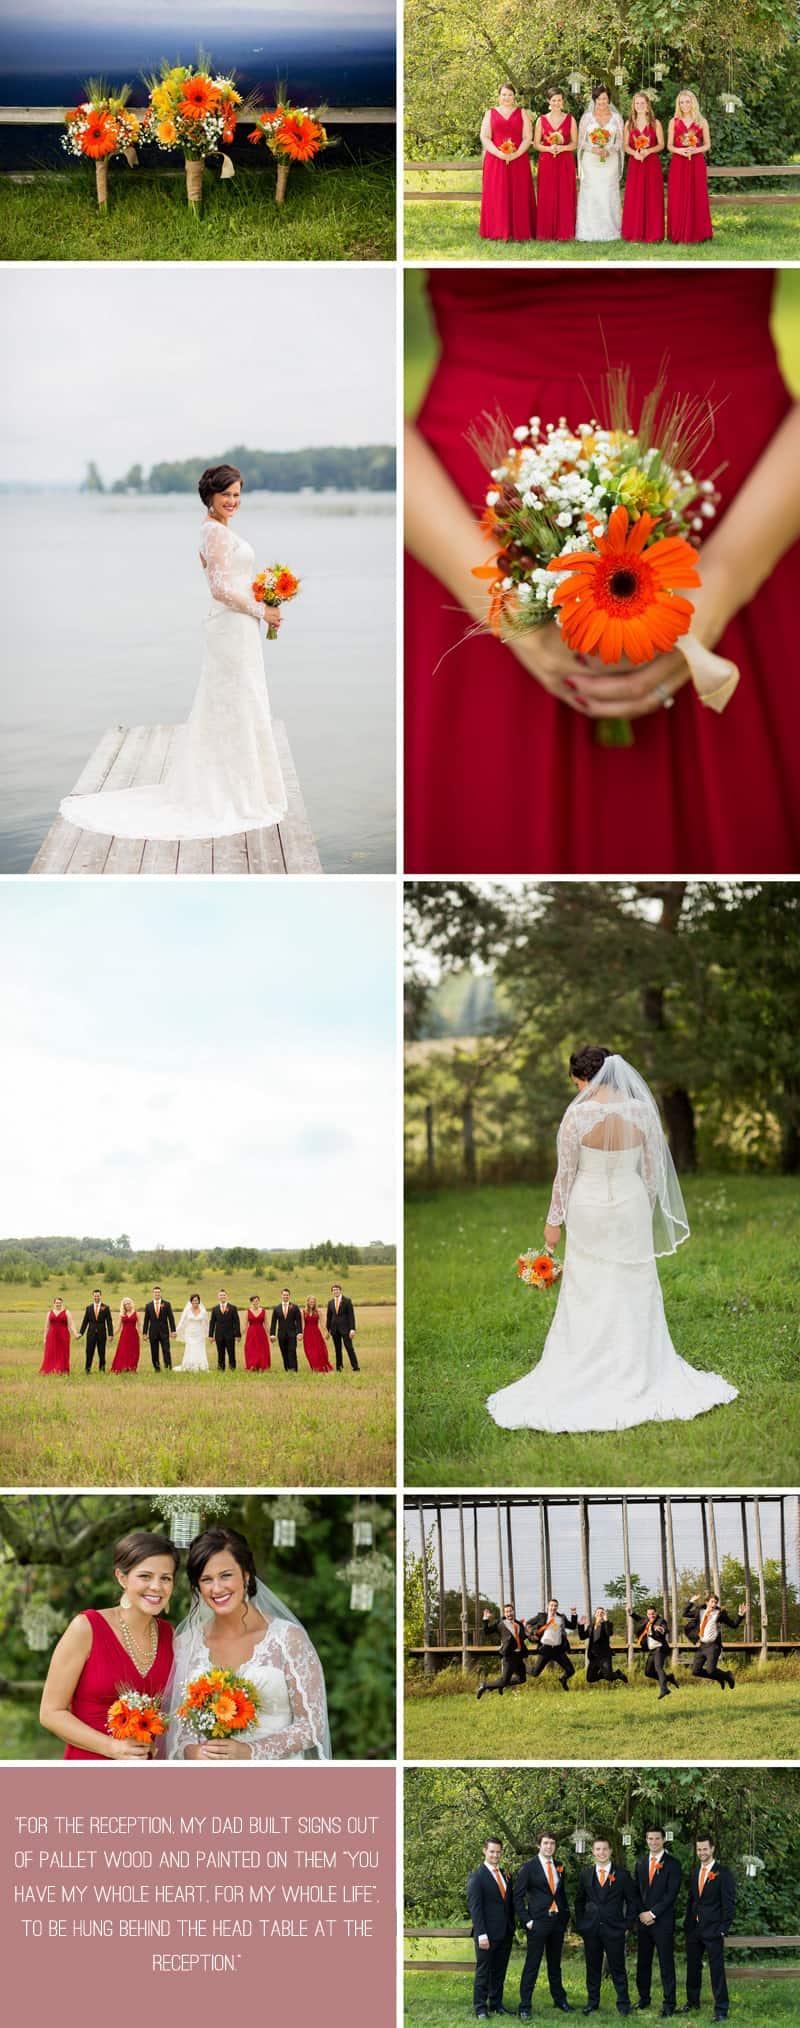 A Romantic Fall Wedding in a Rustic Barn 4